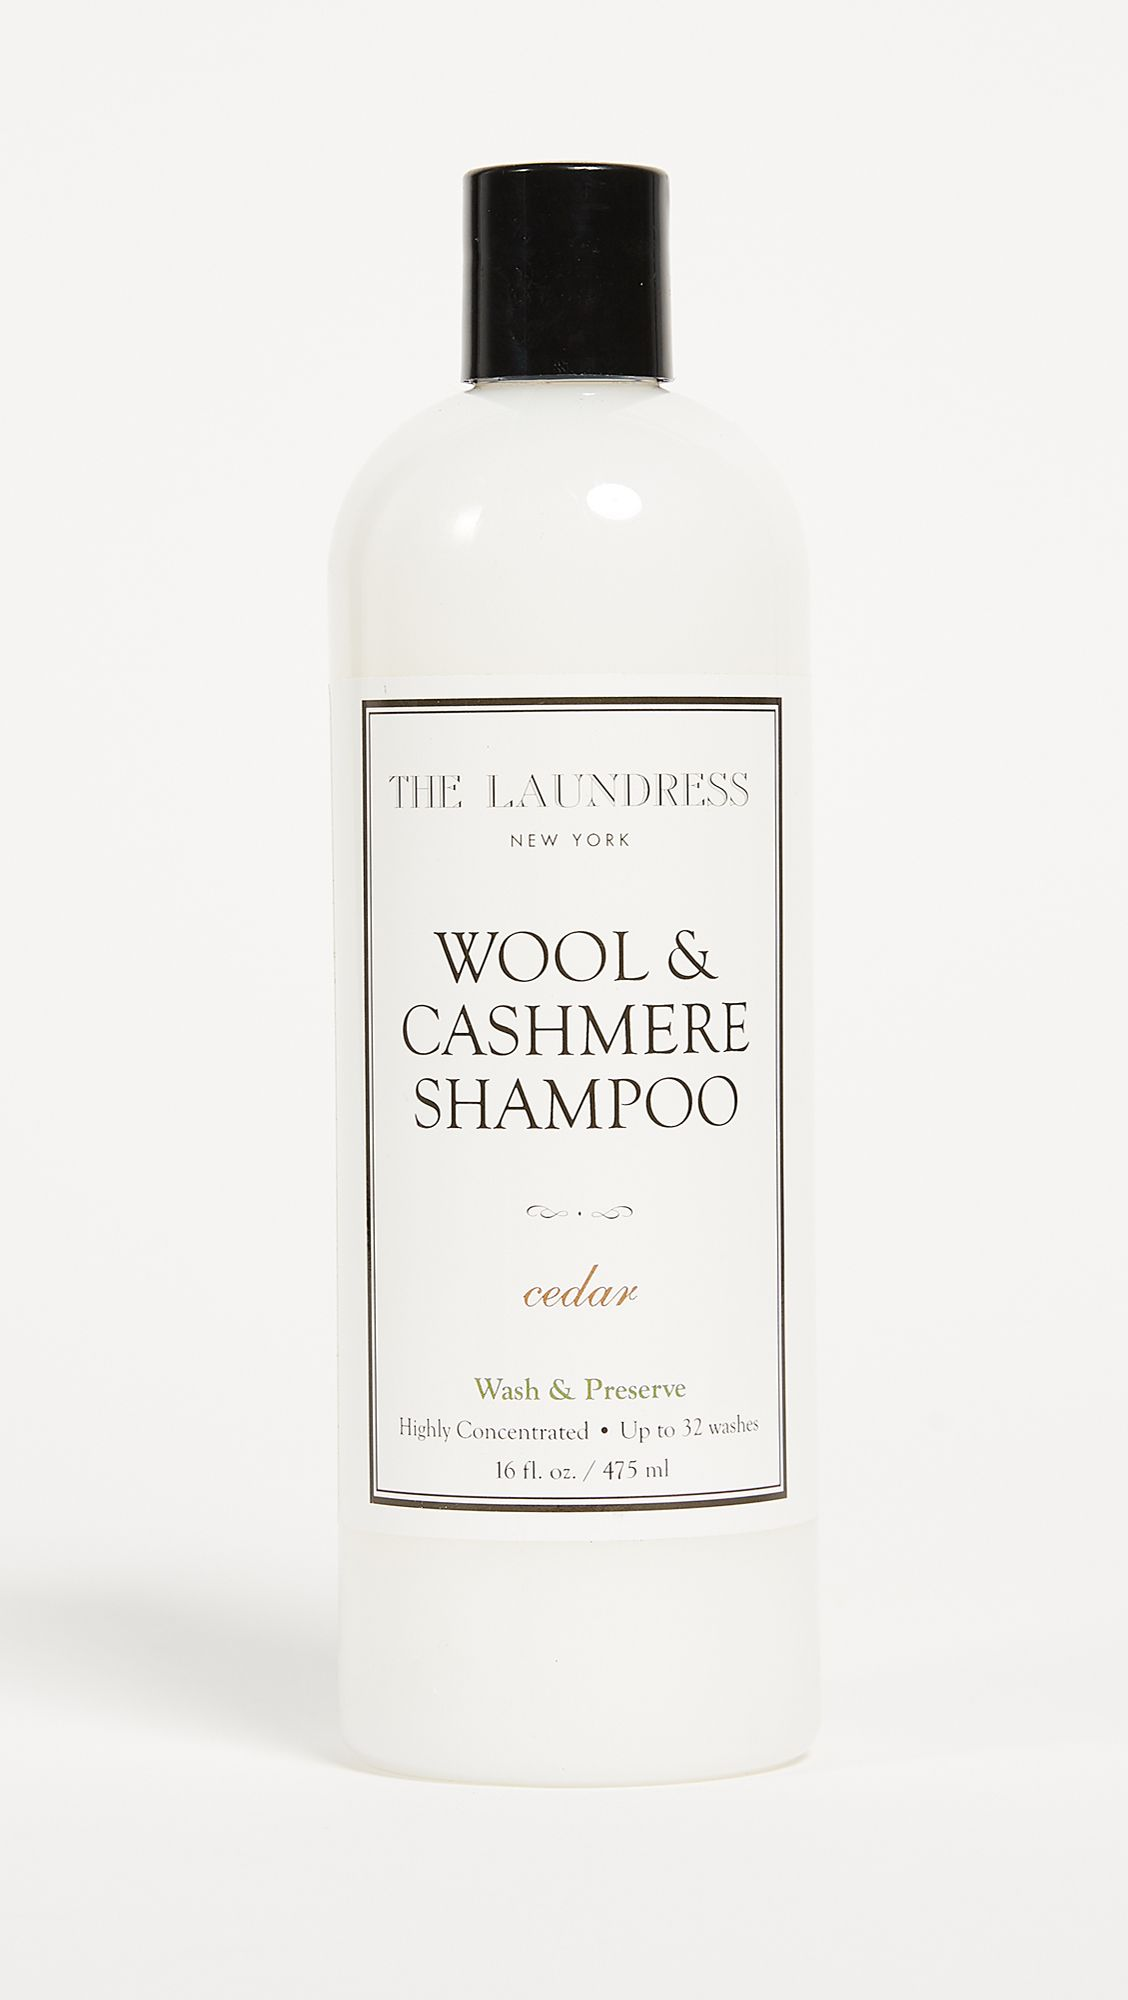 The Laundress Wool & Cashmere Shampoo Laundress